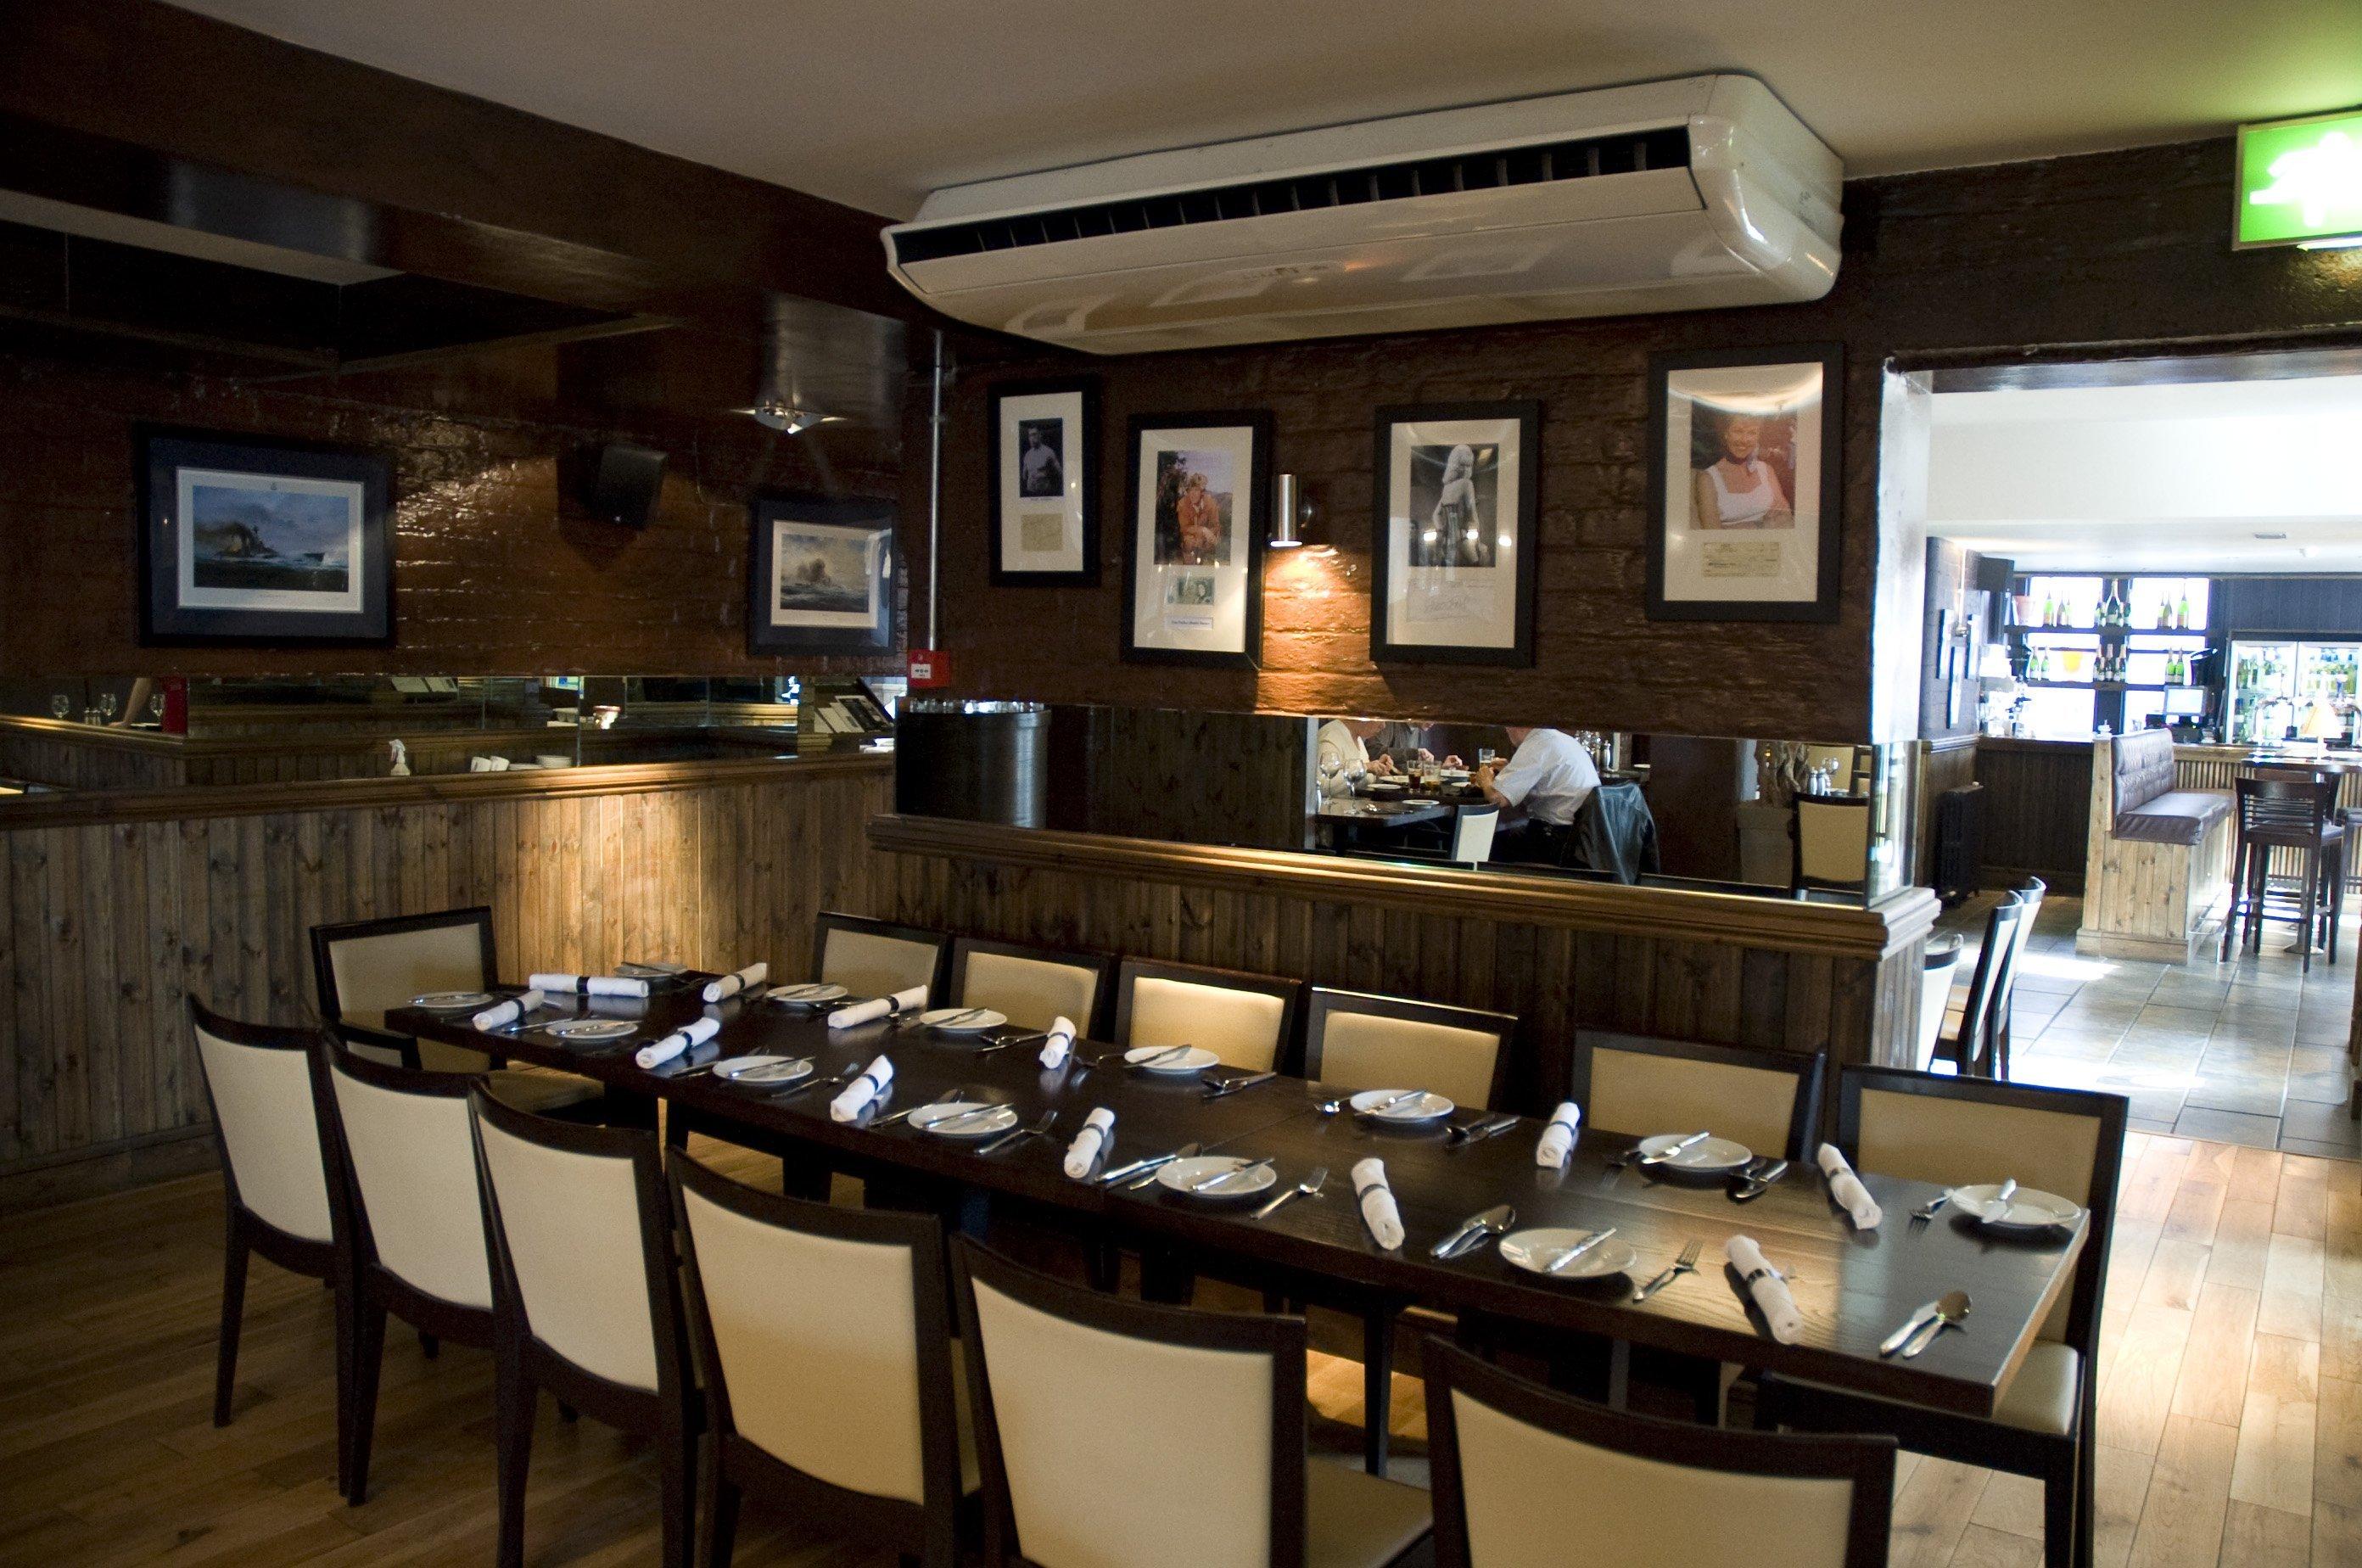 Restaurant air conditioning installation